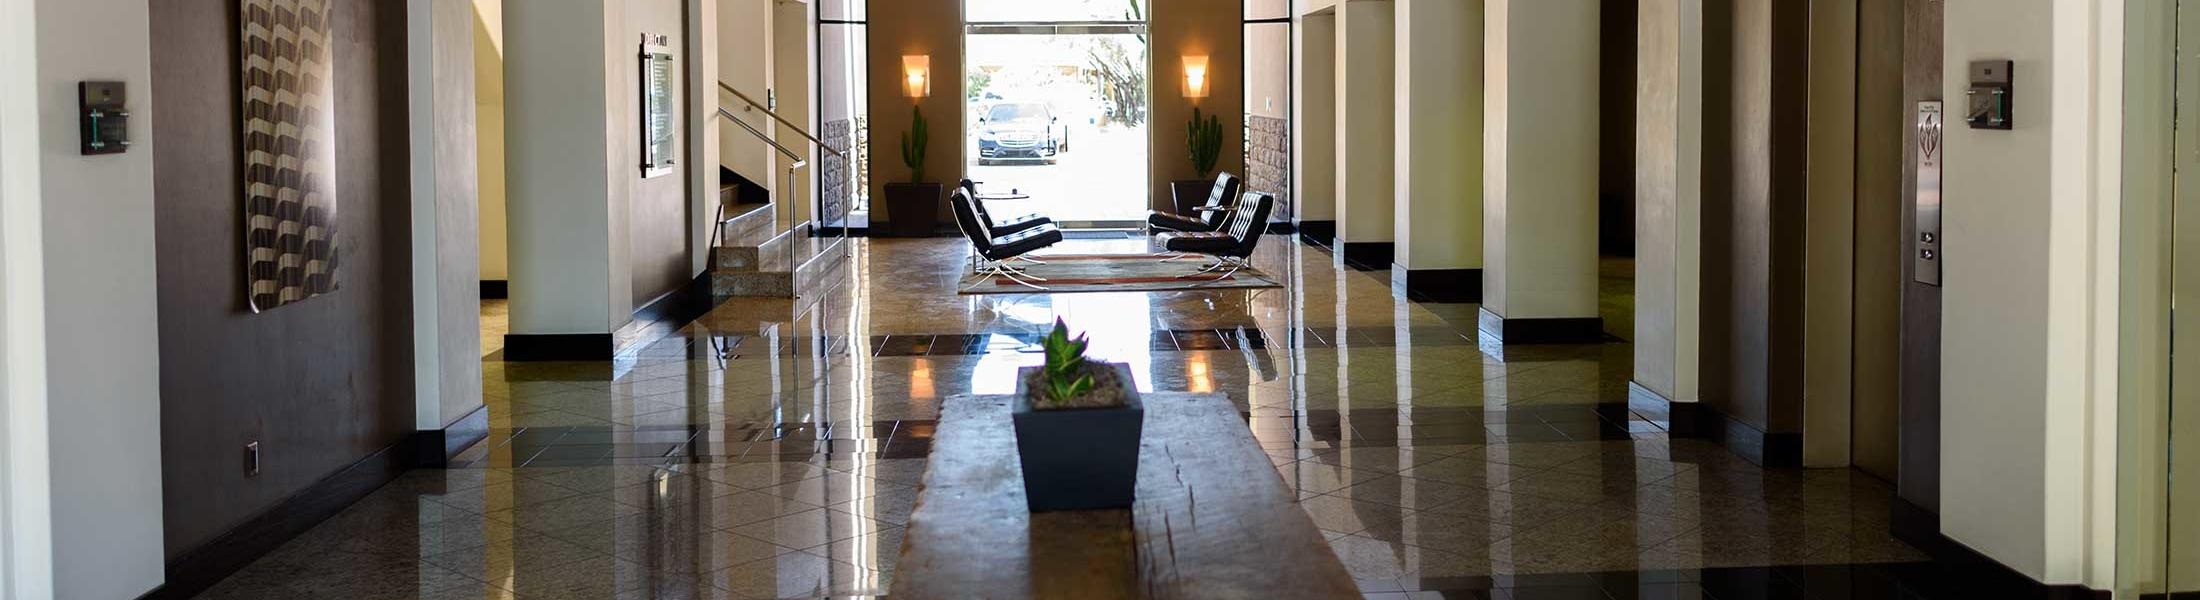 Estate Planning Attorneys Lobby